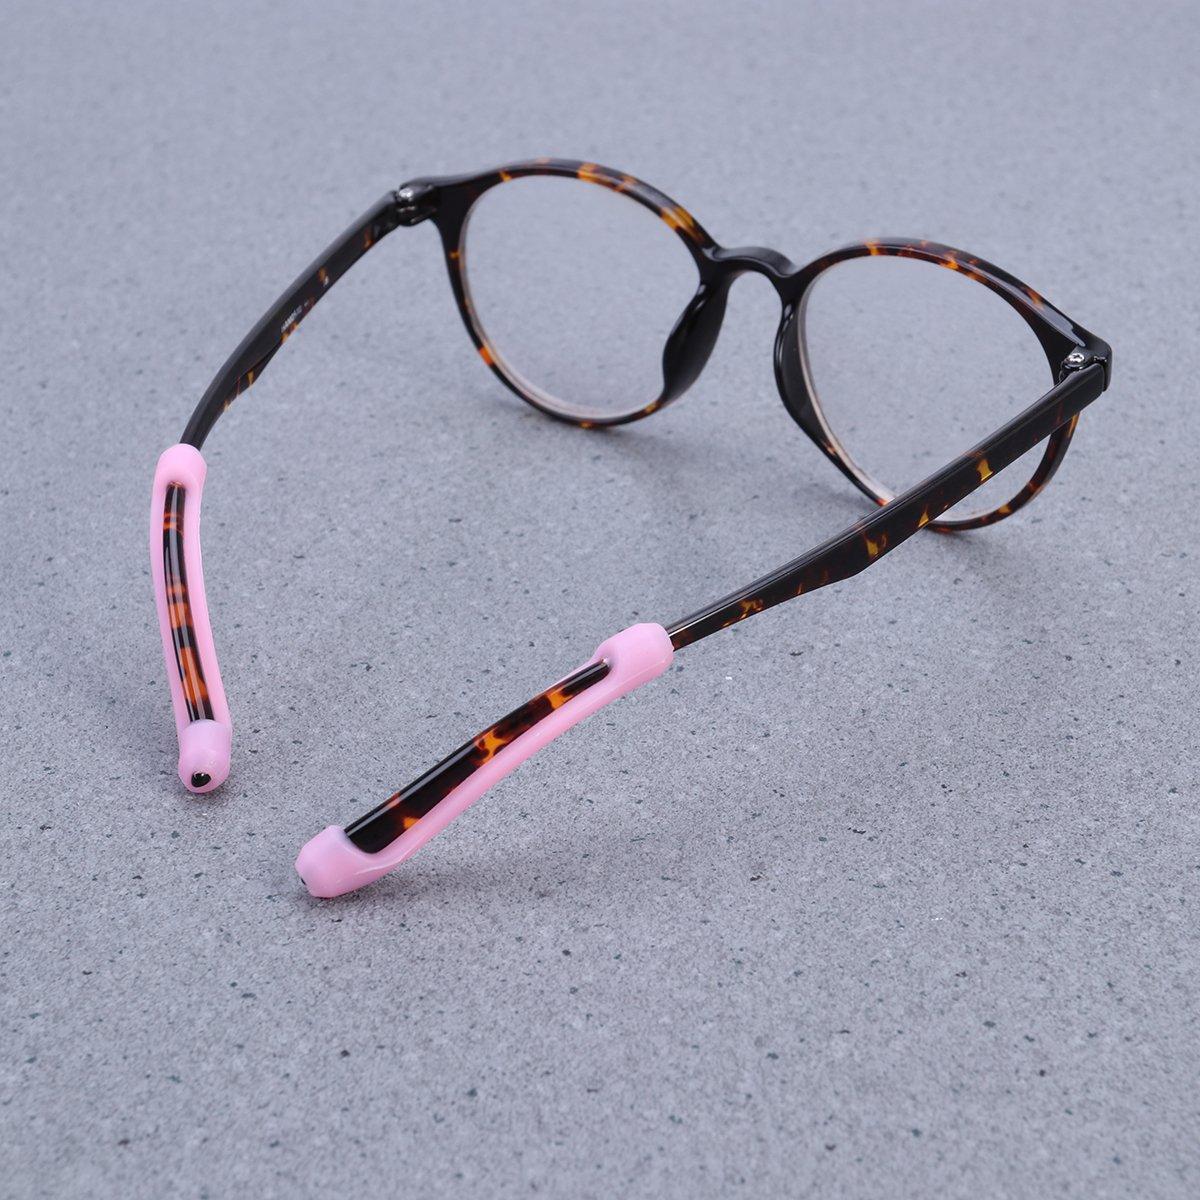 ROSENICE Silicone Anti Slip Ear Hooks for Eyeglass Sunglasses 5 Pairs Pink